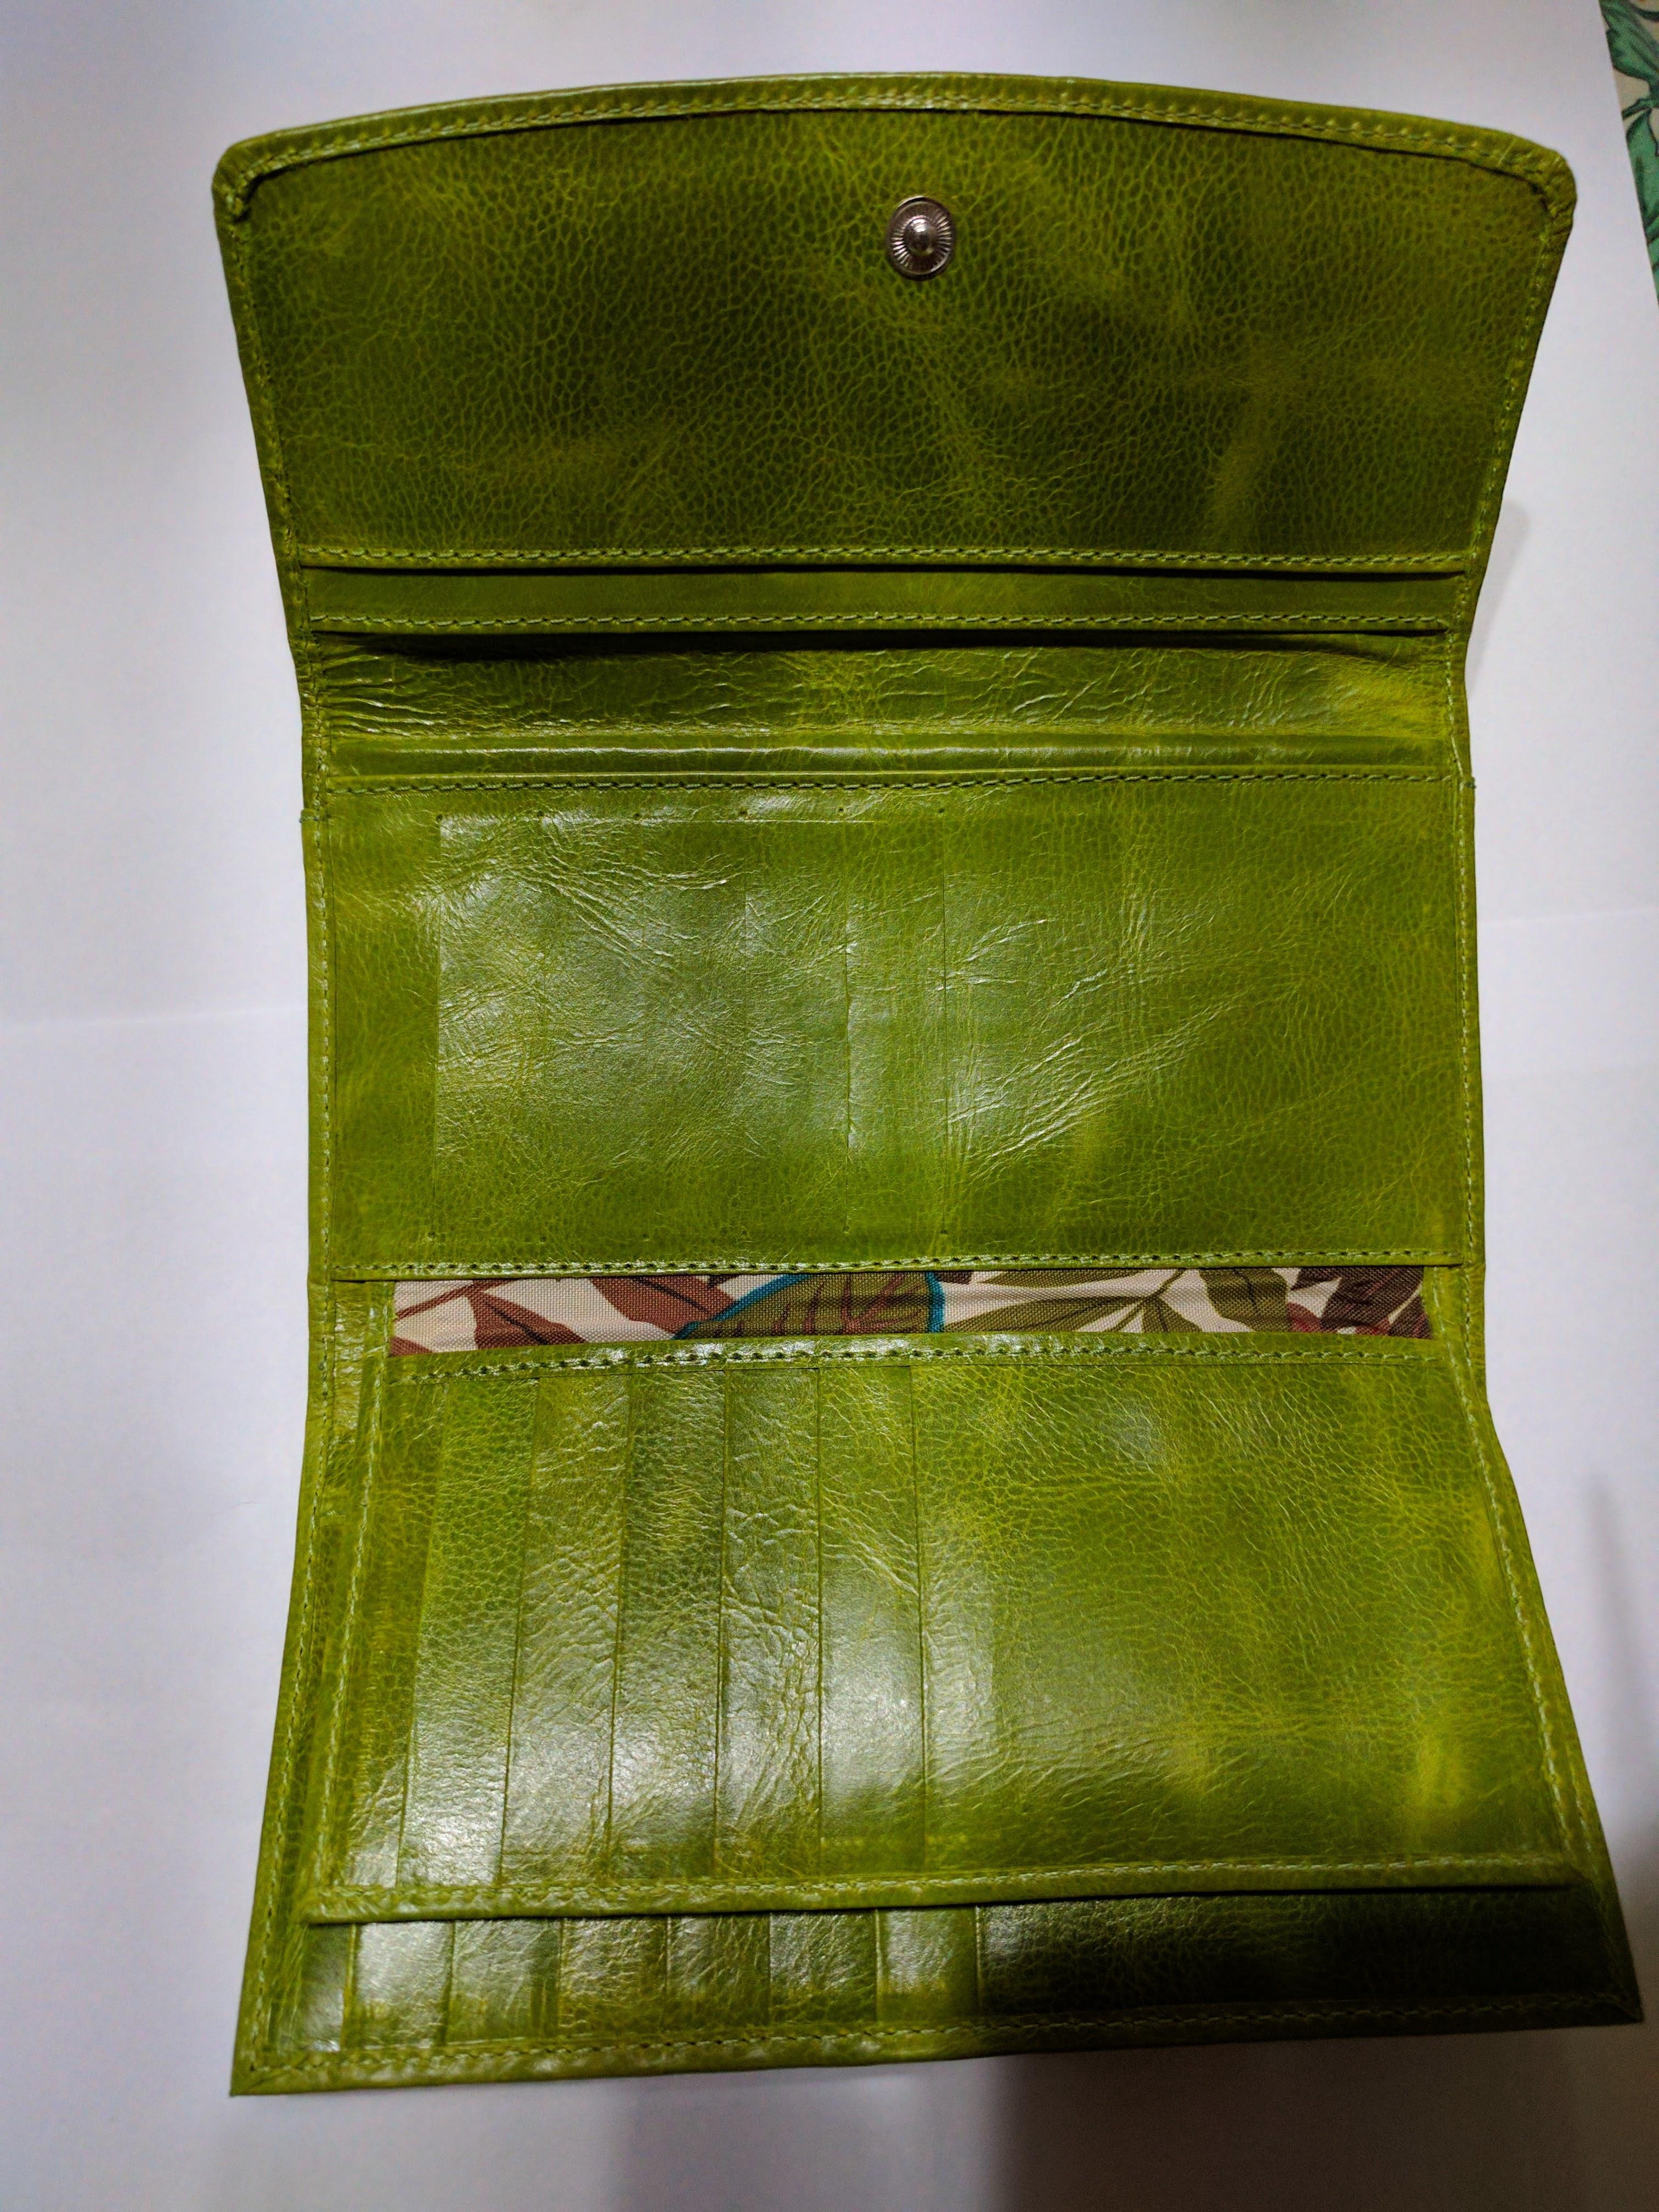 ladies leather money purse etnolatino